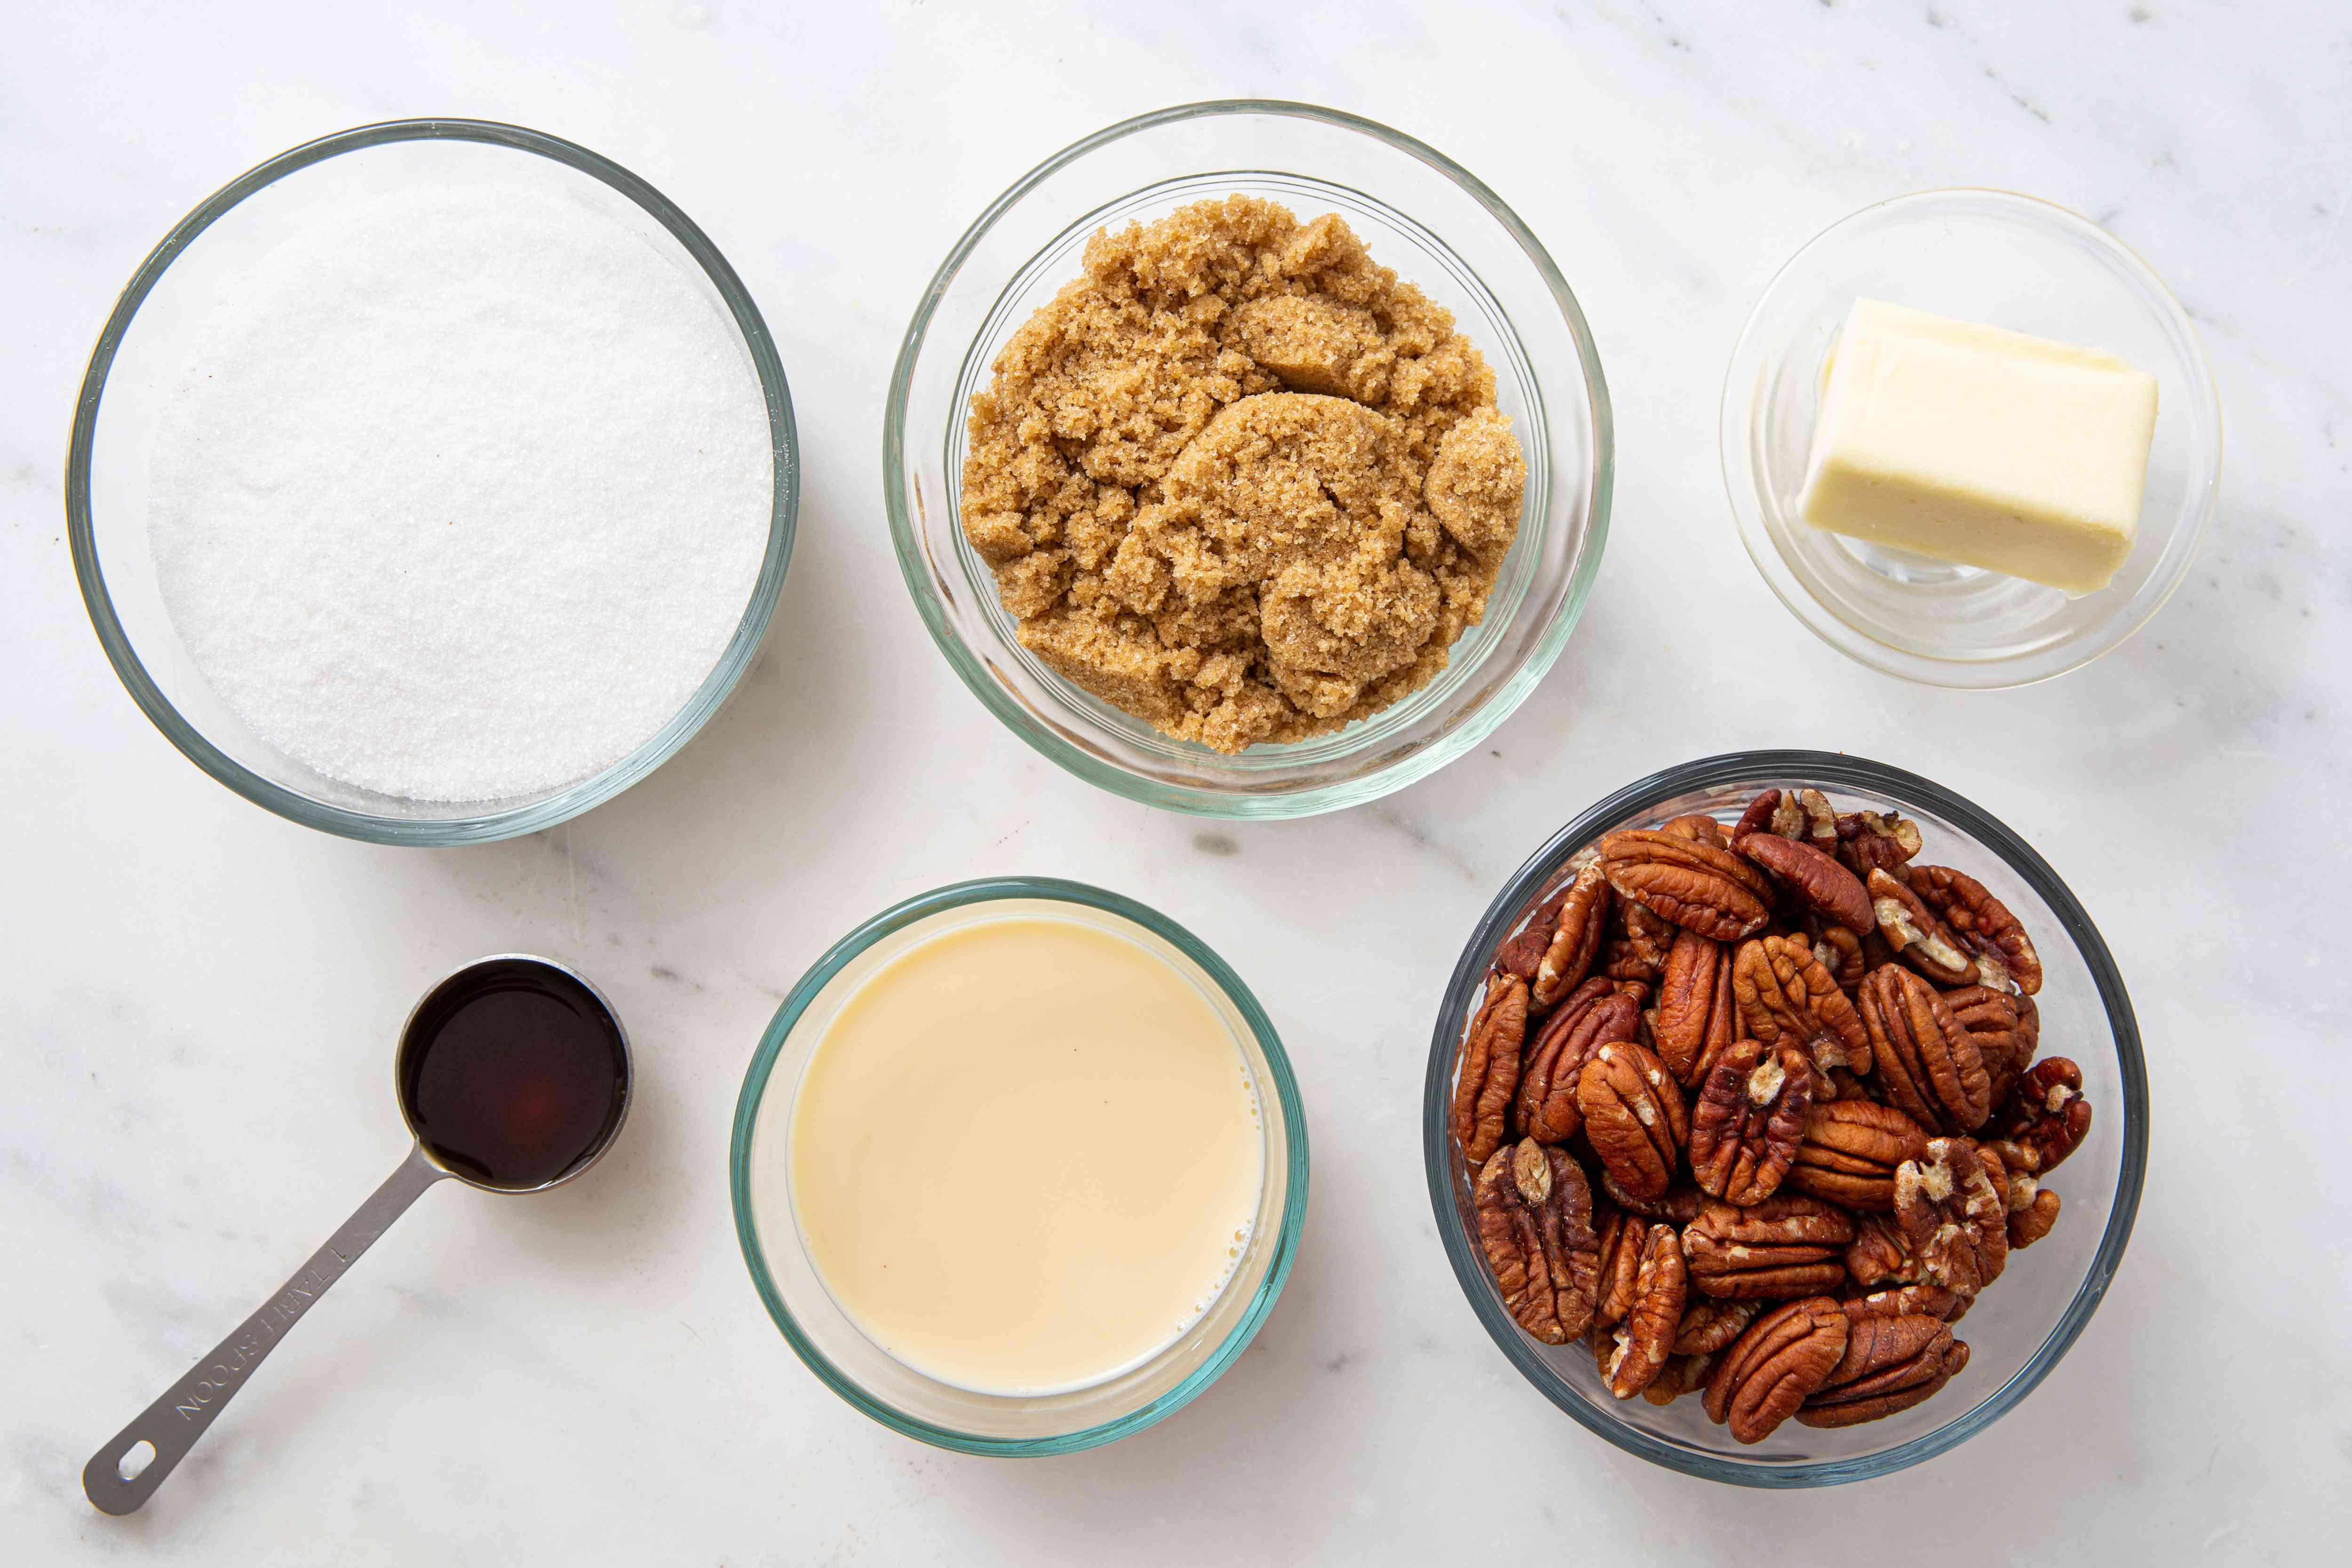 Easy creamy pecan pralines ingredients